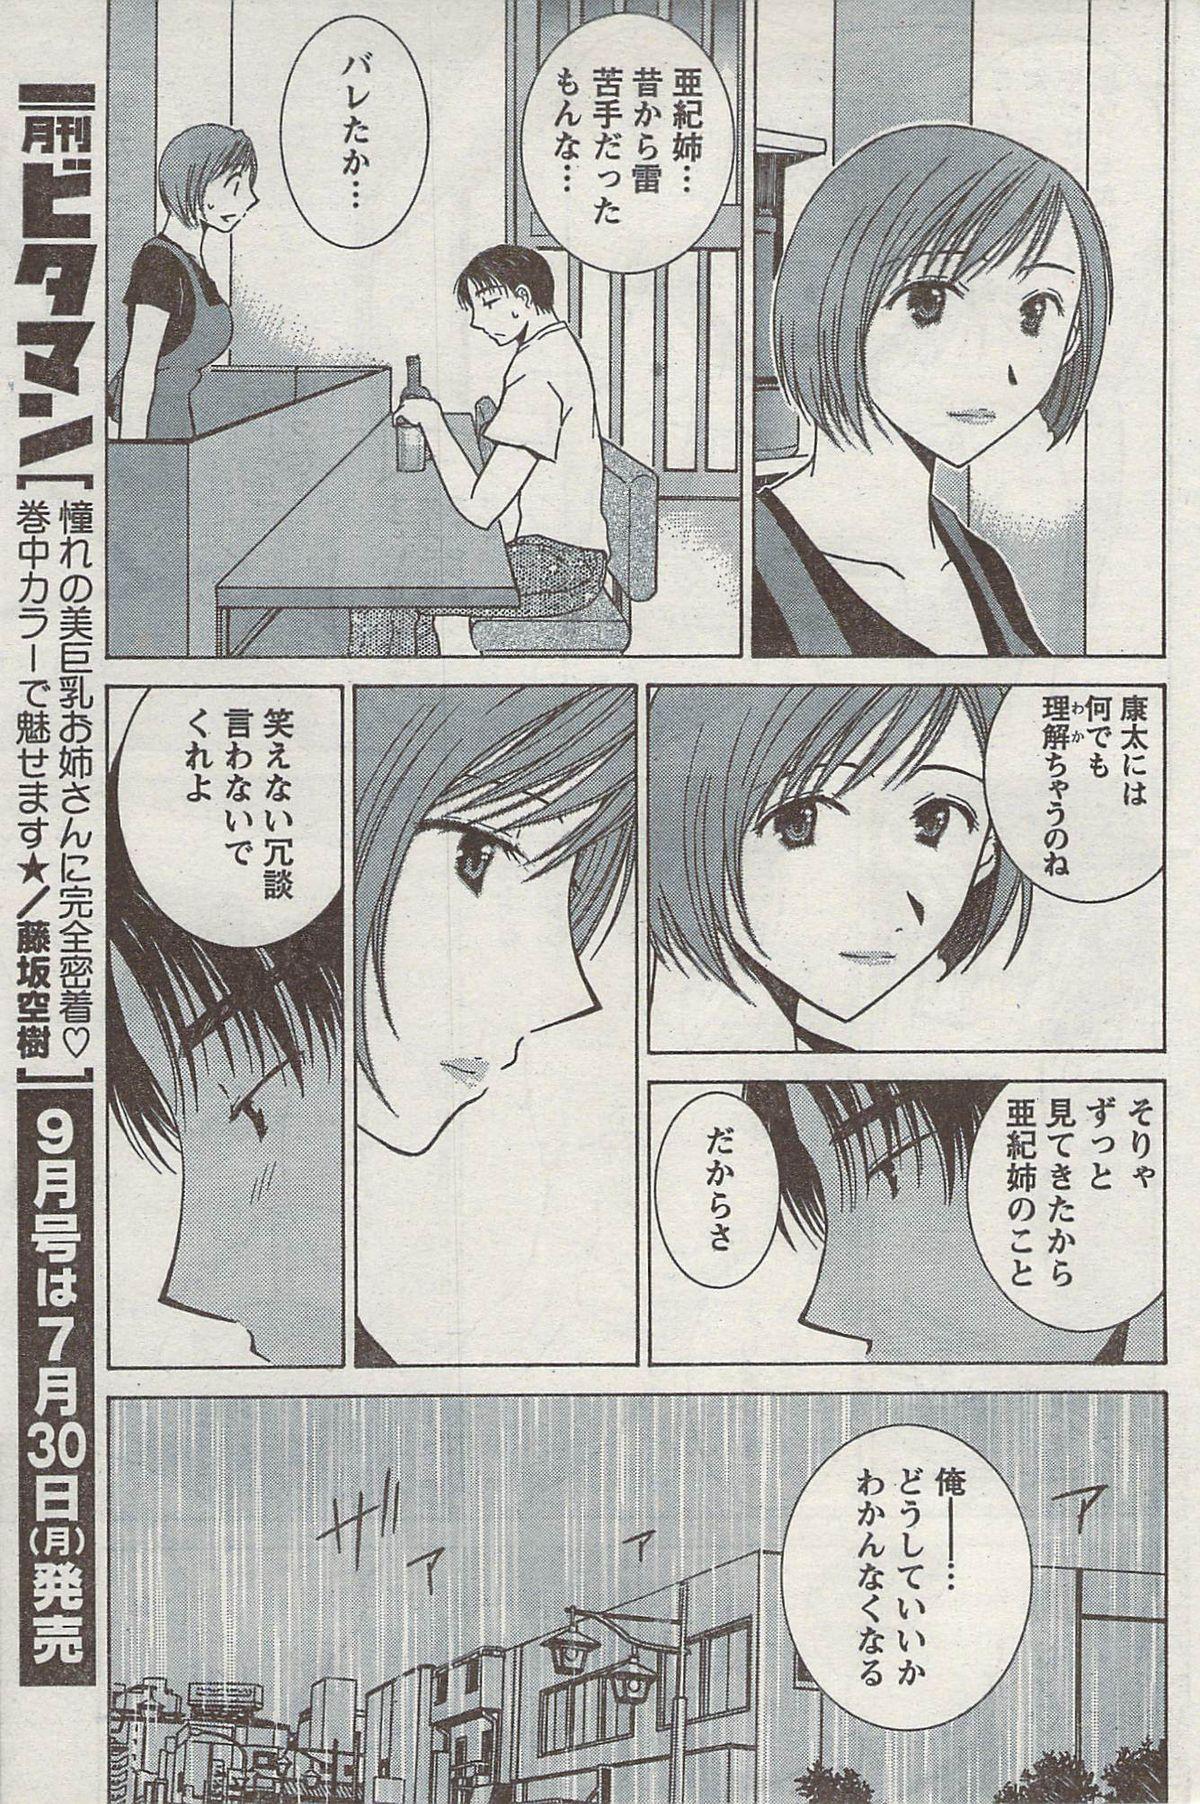 Monthly Vitaman 2007-08 100